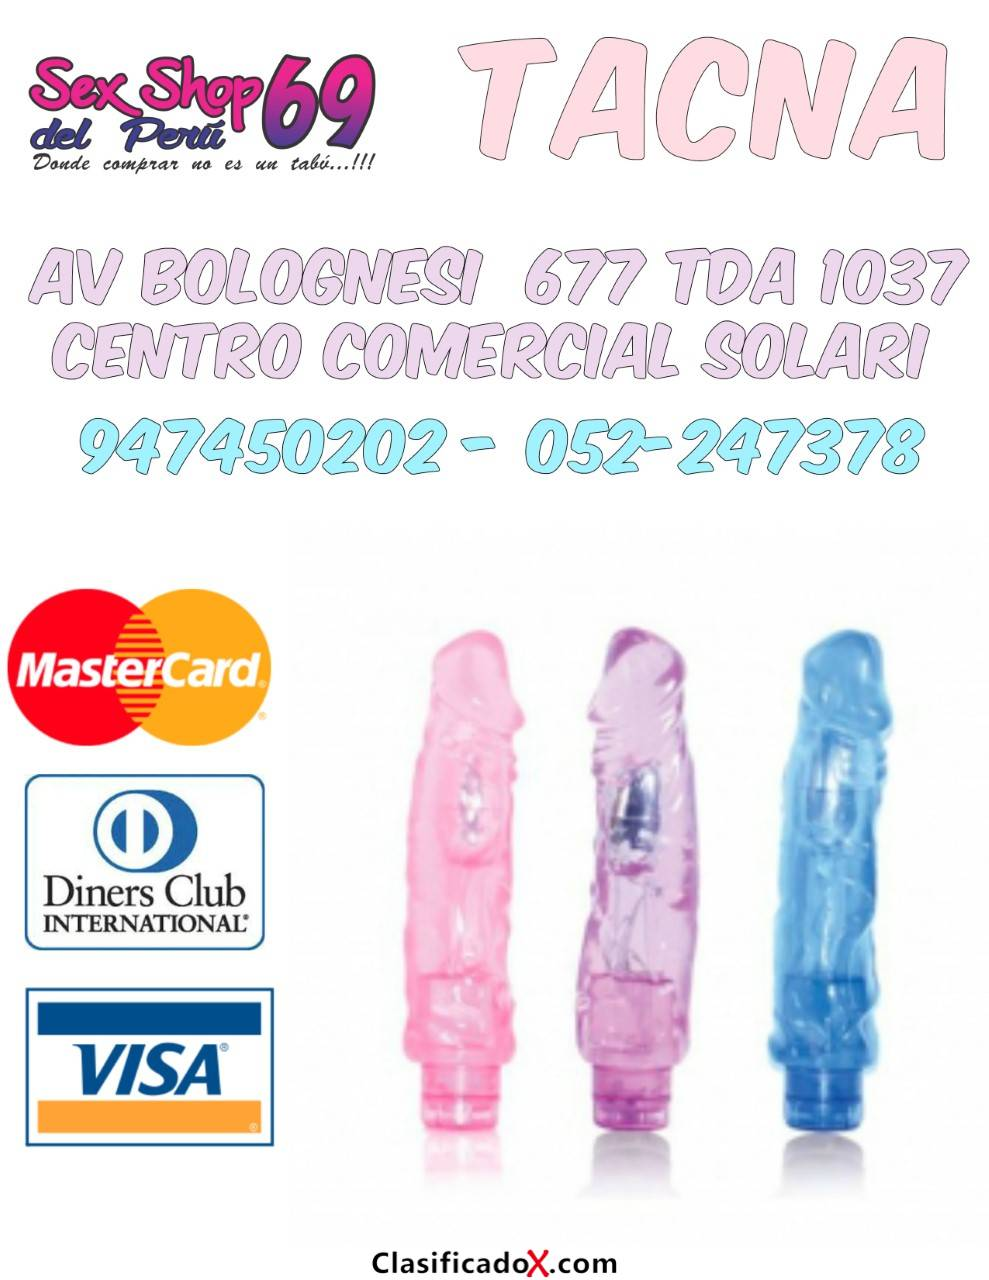 *Tienda Tacna: Av. Bolognesi 677 Tienda 1037 - SEXSHOP PERU 2018 ¡¡¡¡